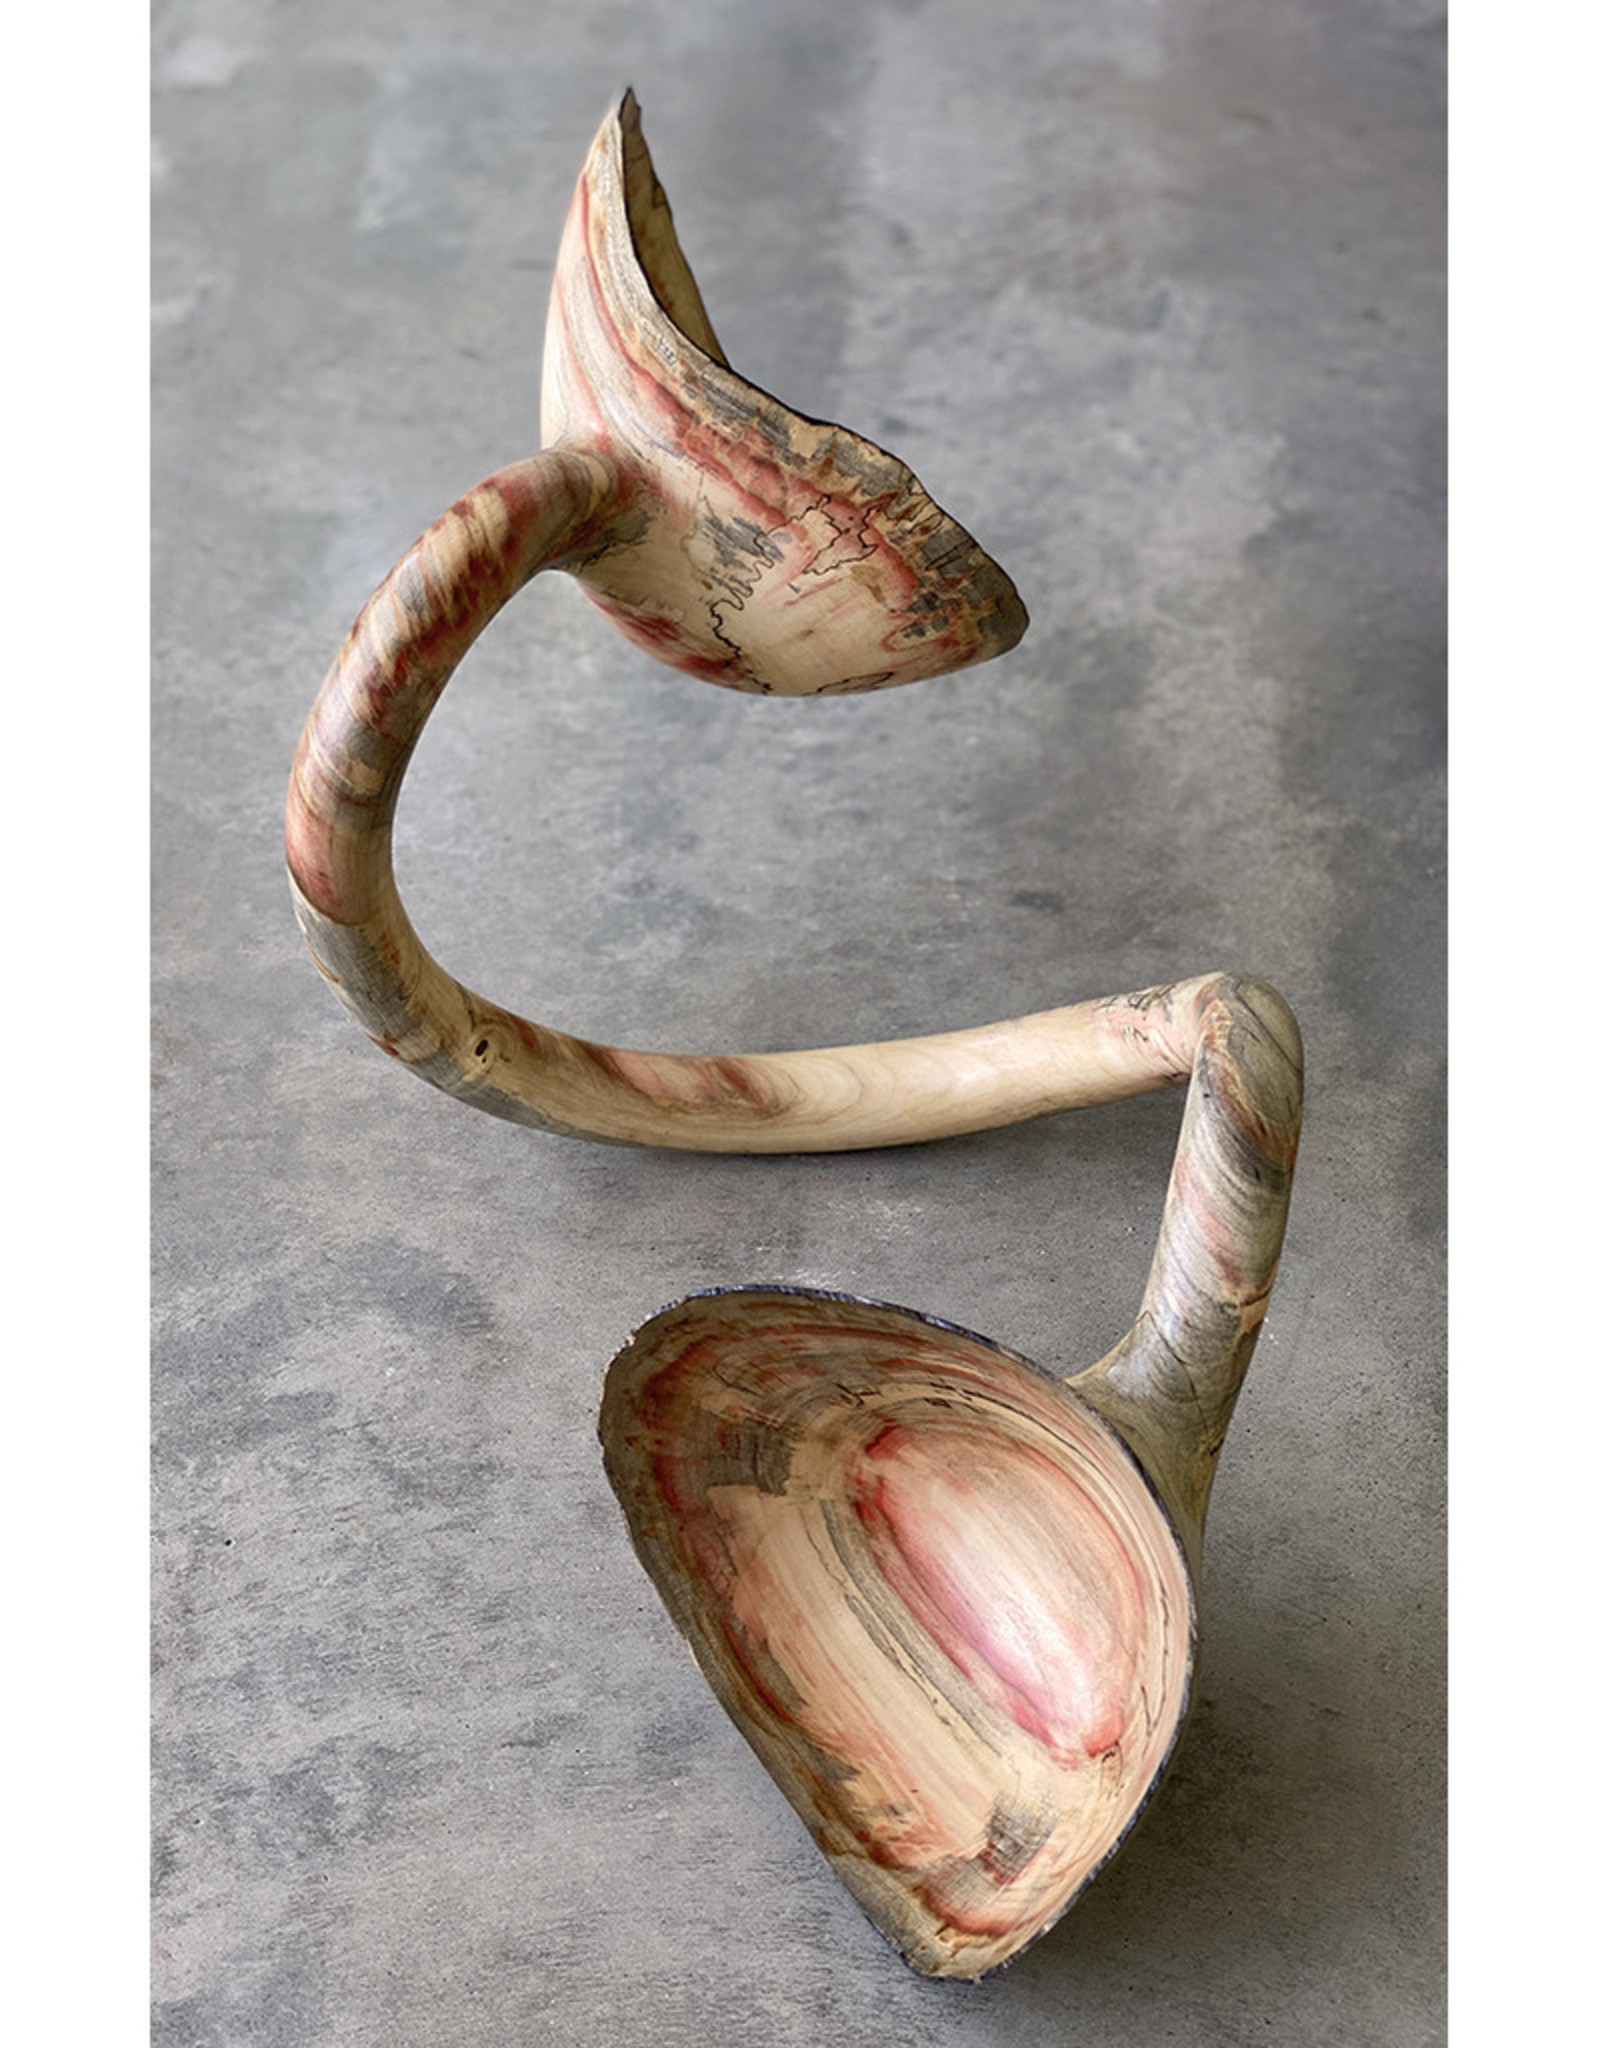 Resurrected Woodworks #92 // Matt Roman